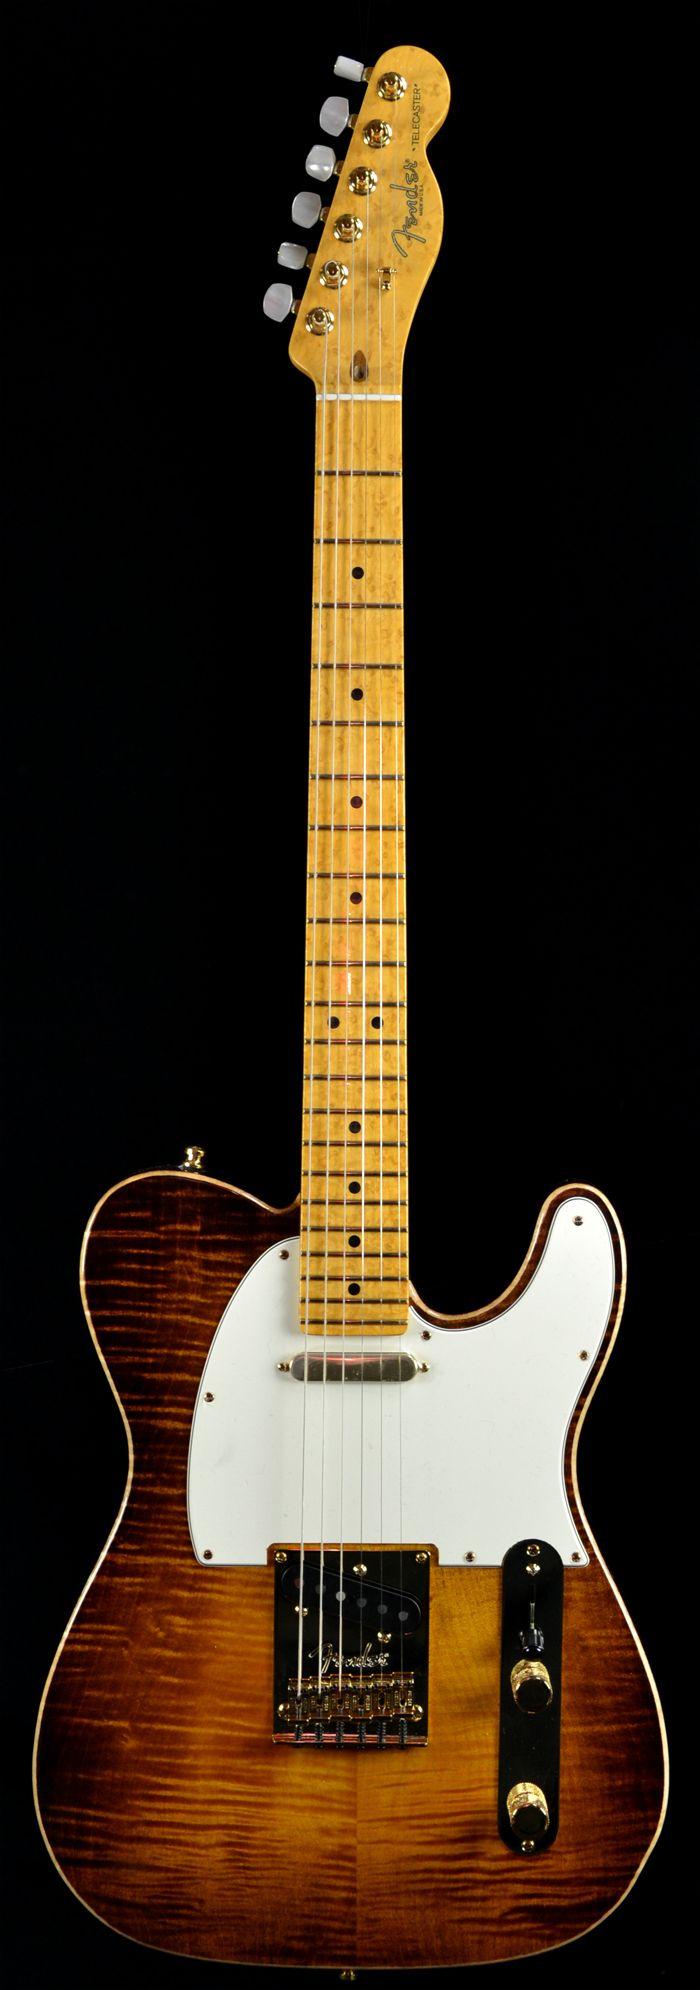 Wild West Guitars : Fender Select Telecaster Chambered Ash Body Violin Burst Gold Hardware